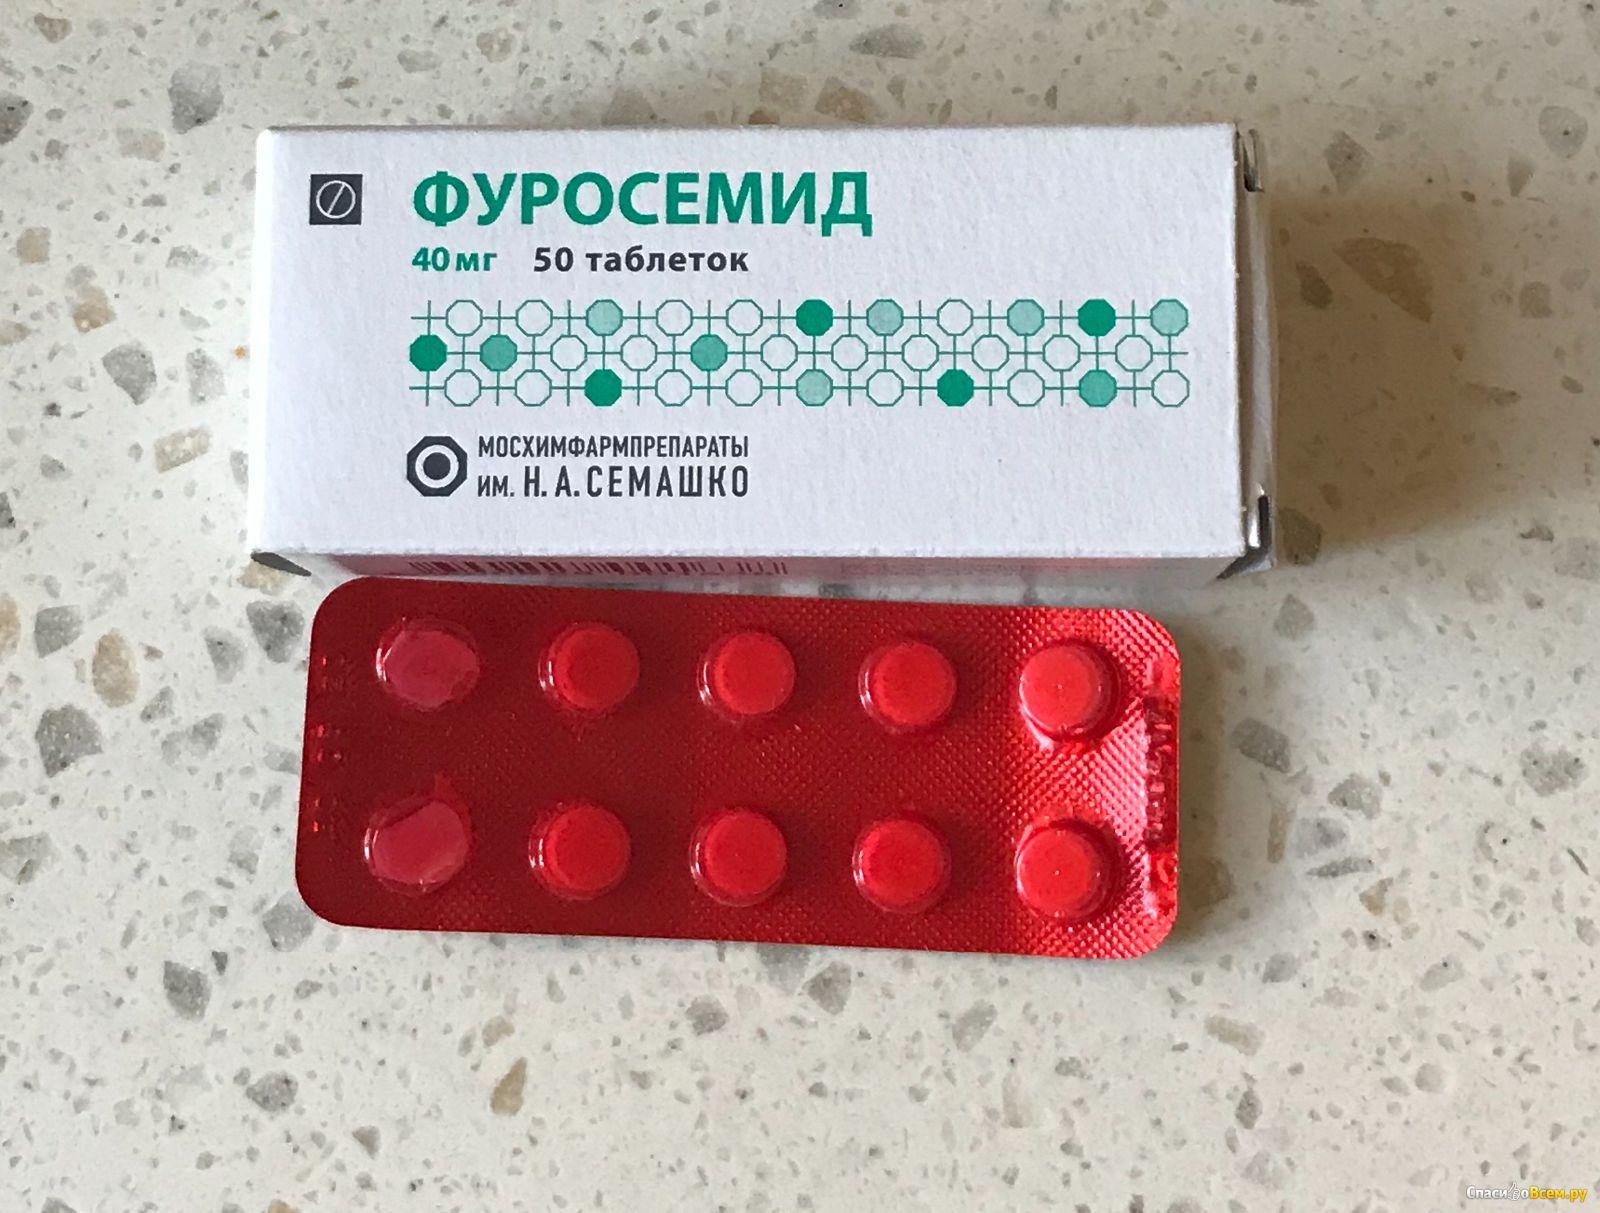 Фуросемид таблетки похудение